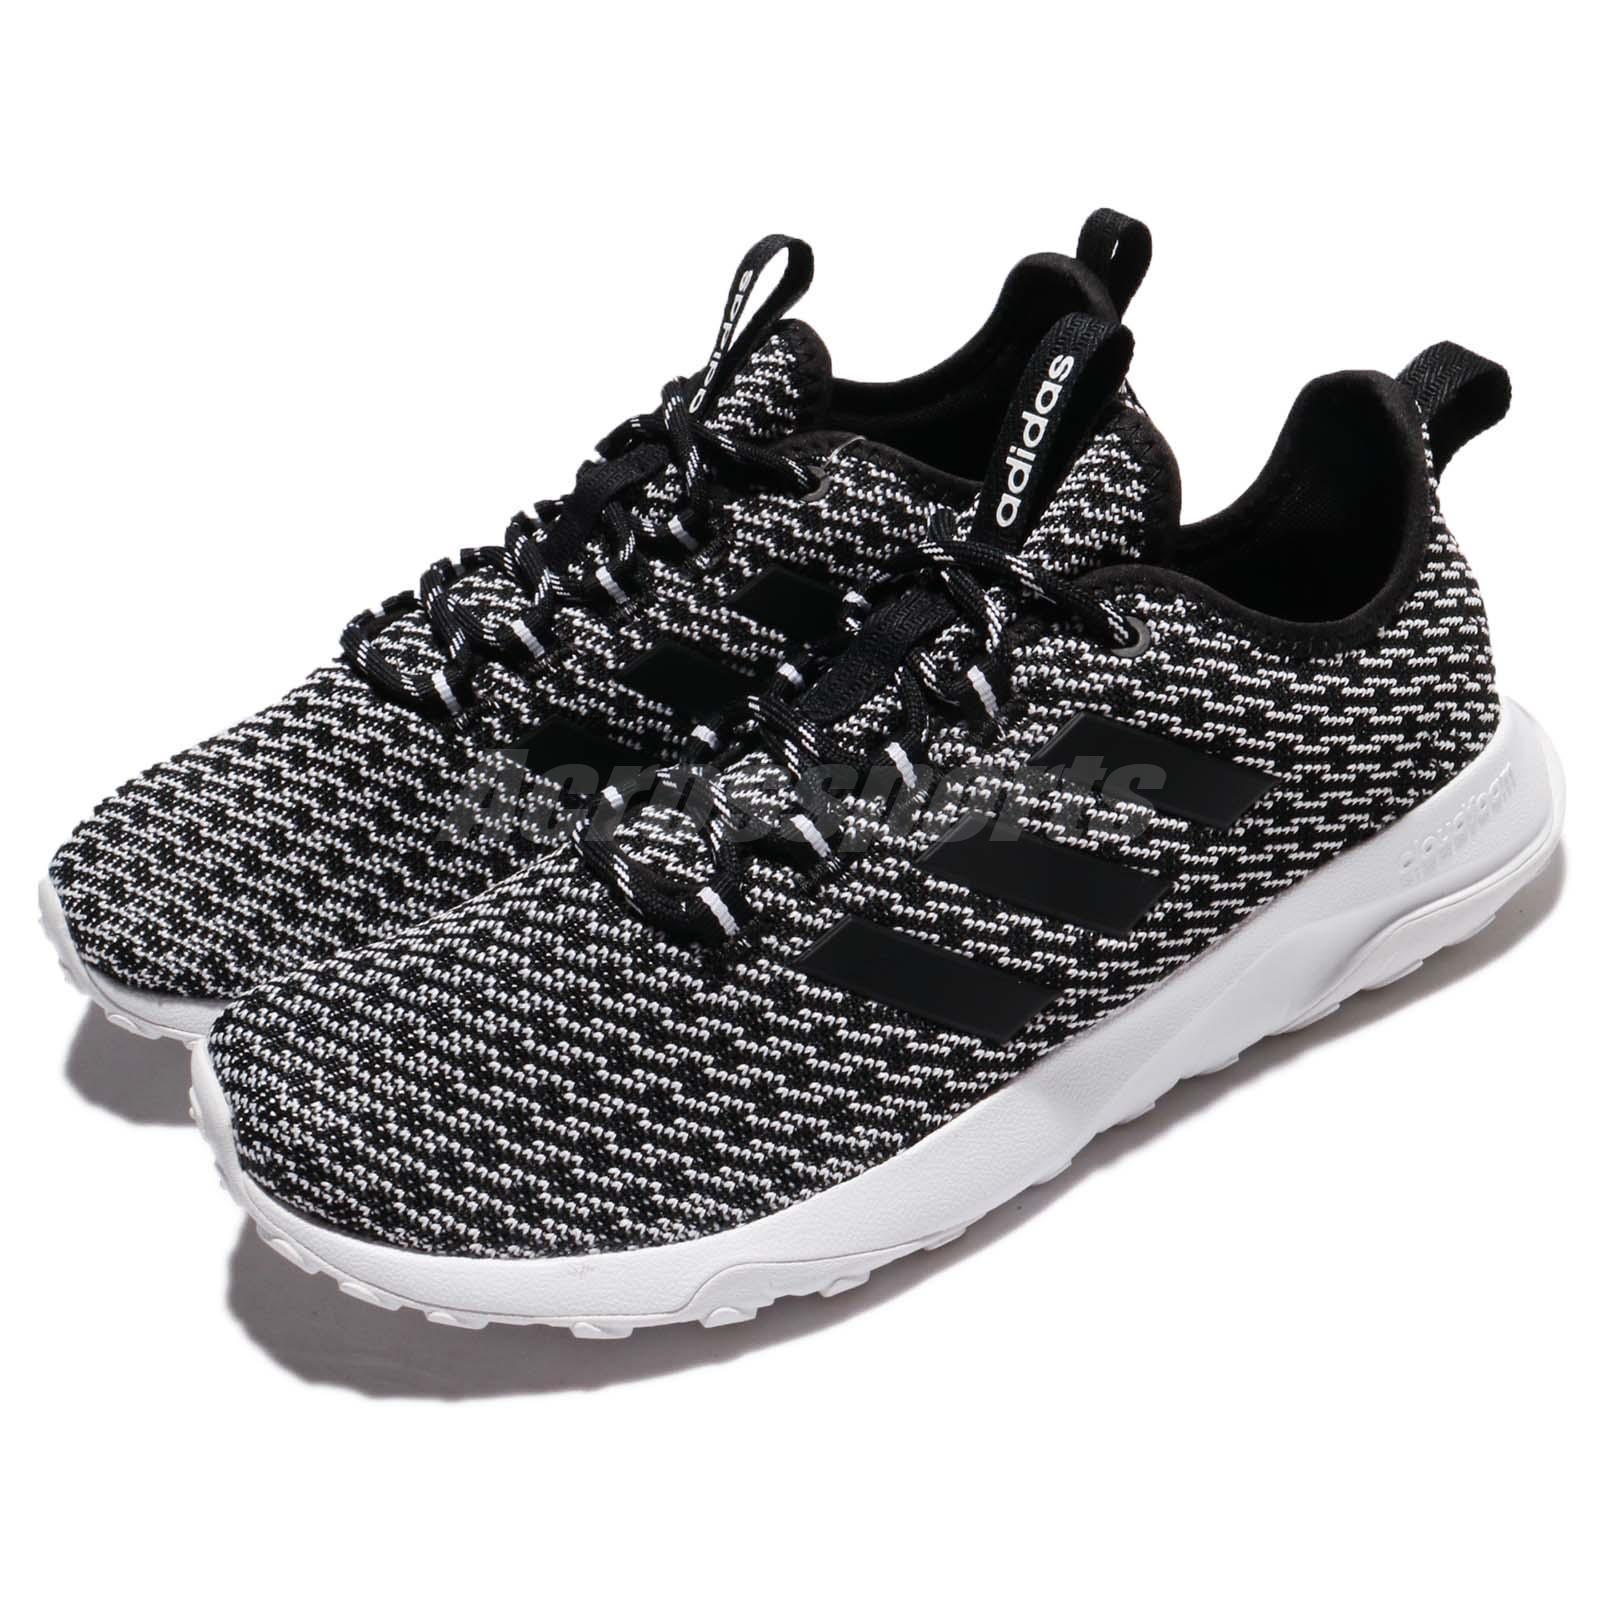 Adidas FC Superflex TR negro blanco hombre Cross Training zapatos Sneakers